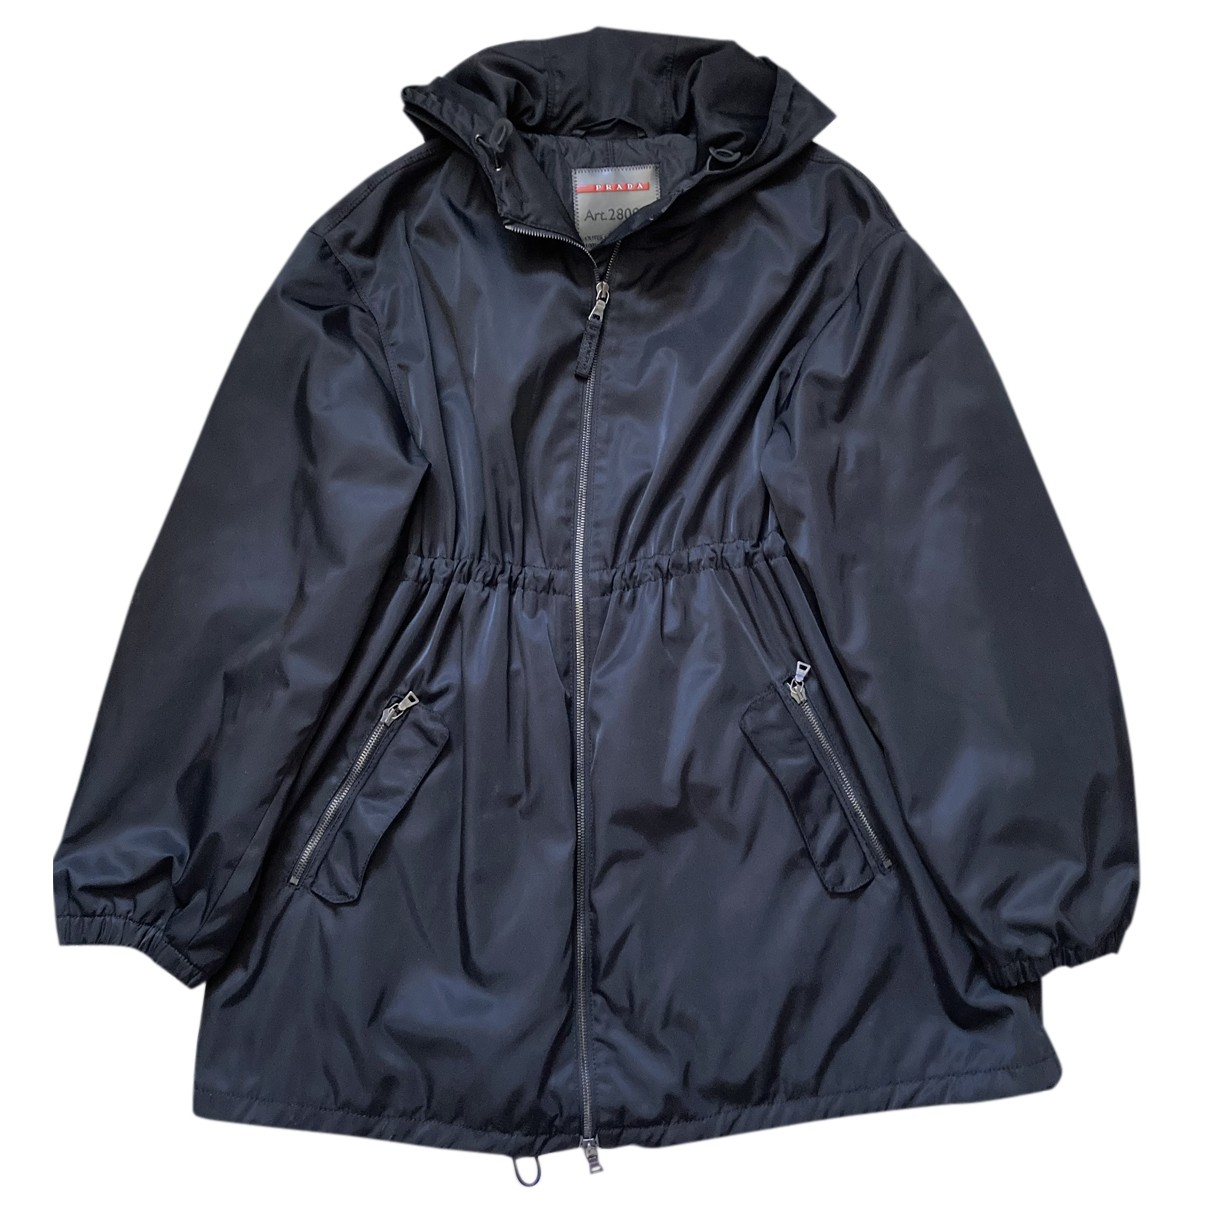 Prada N Black jacket for Women L International